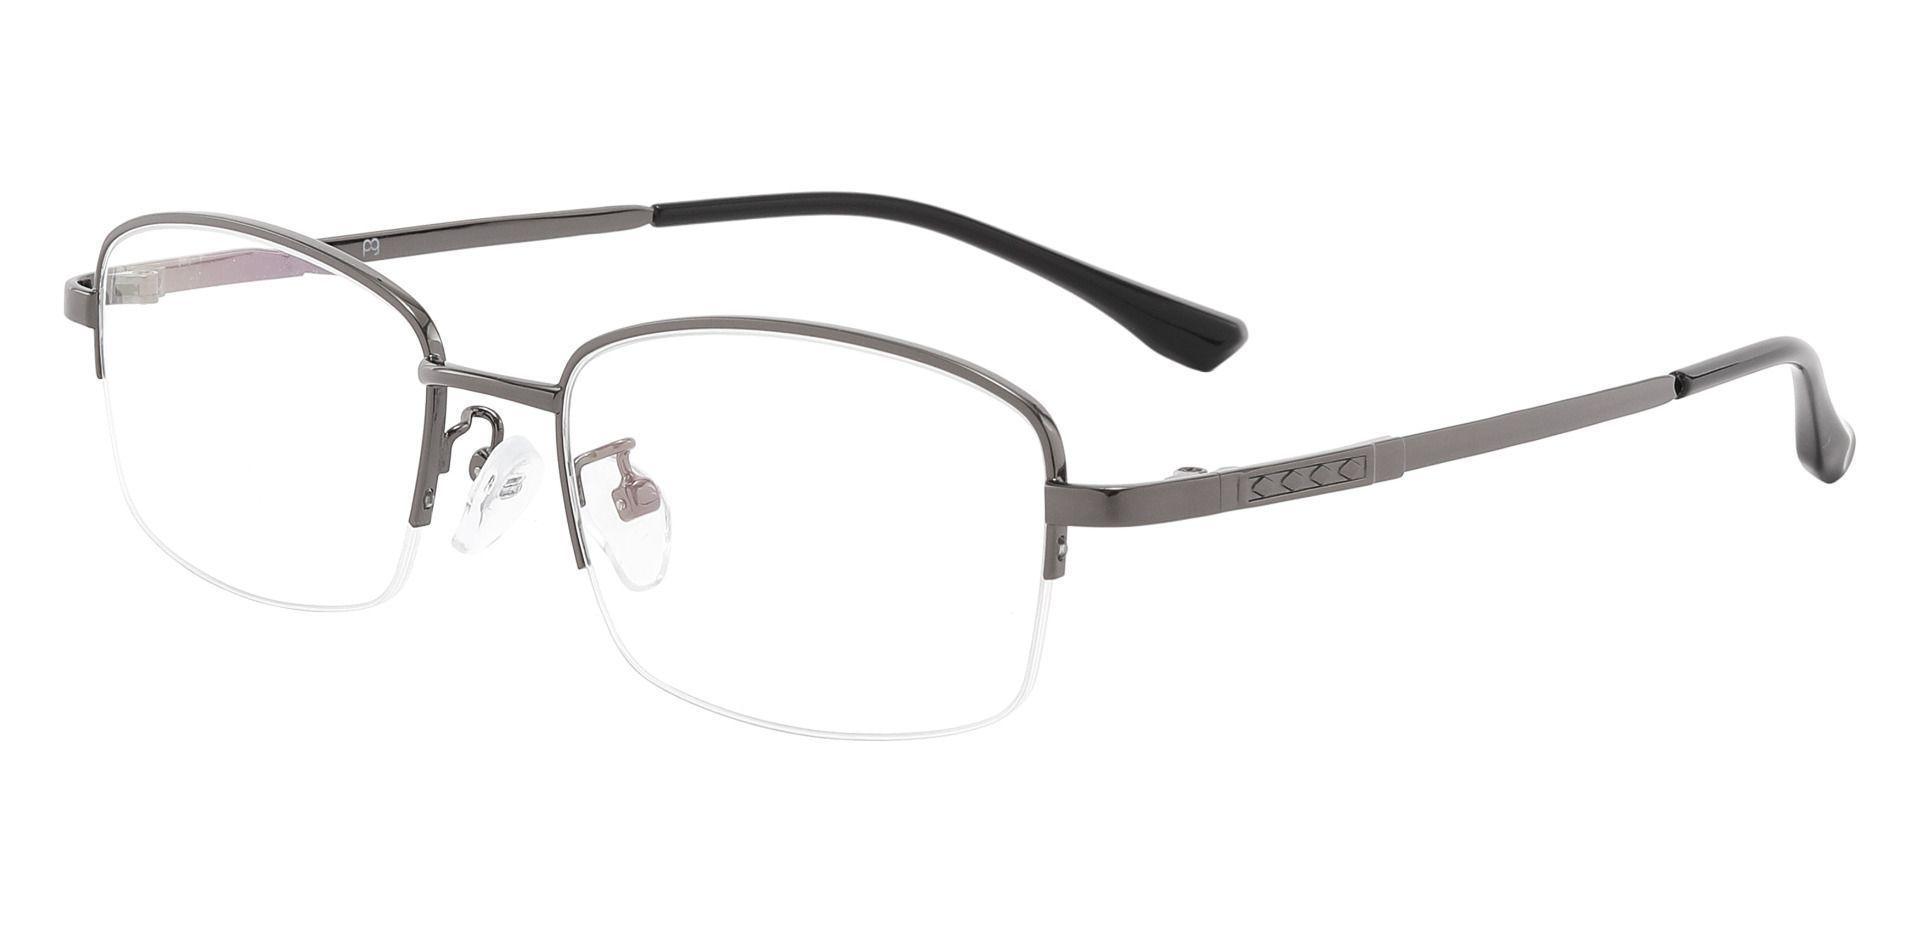 Hopkins Rectangle Prescription Glasses - Gray